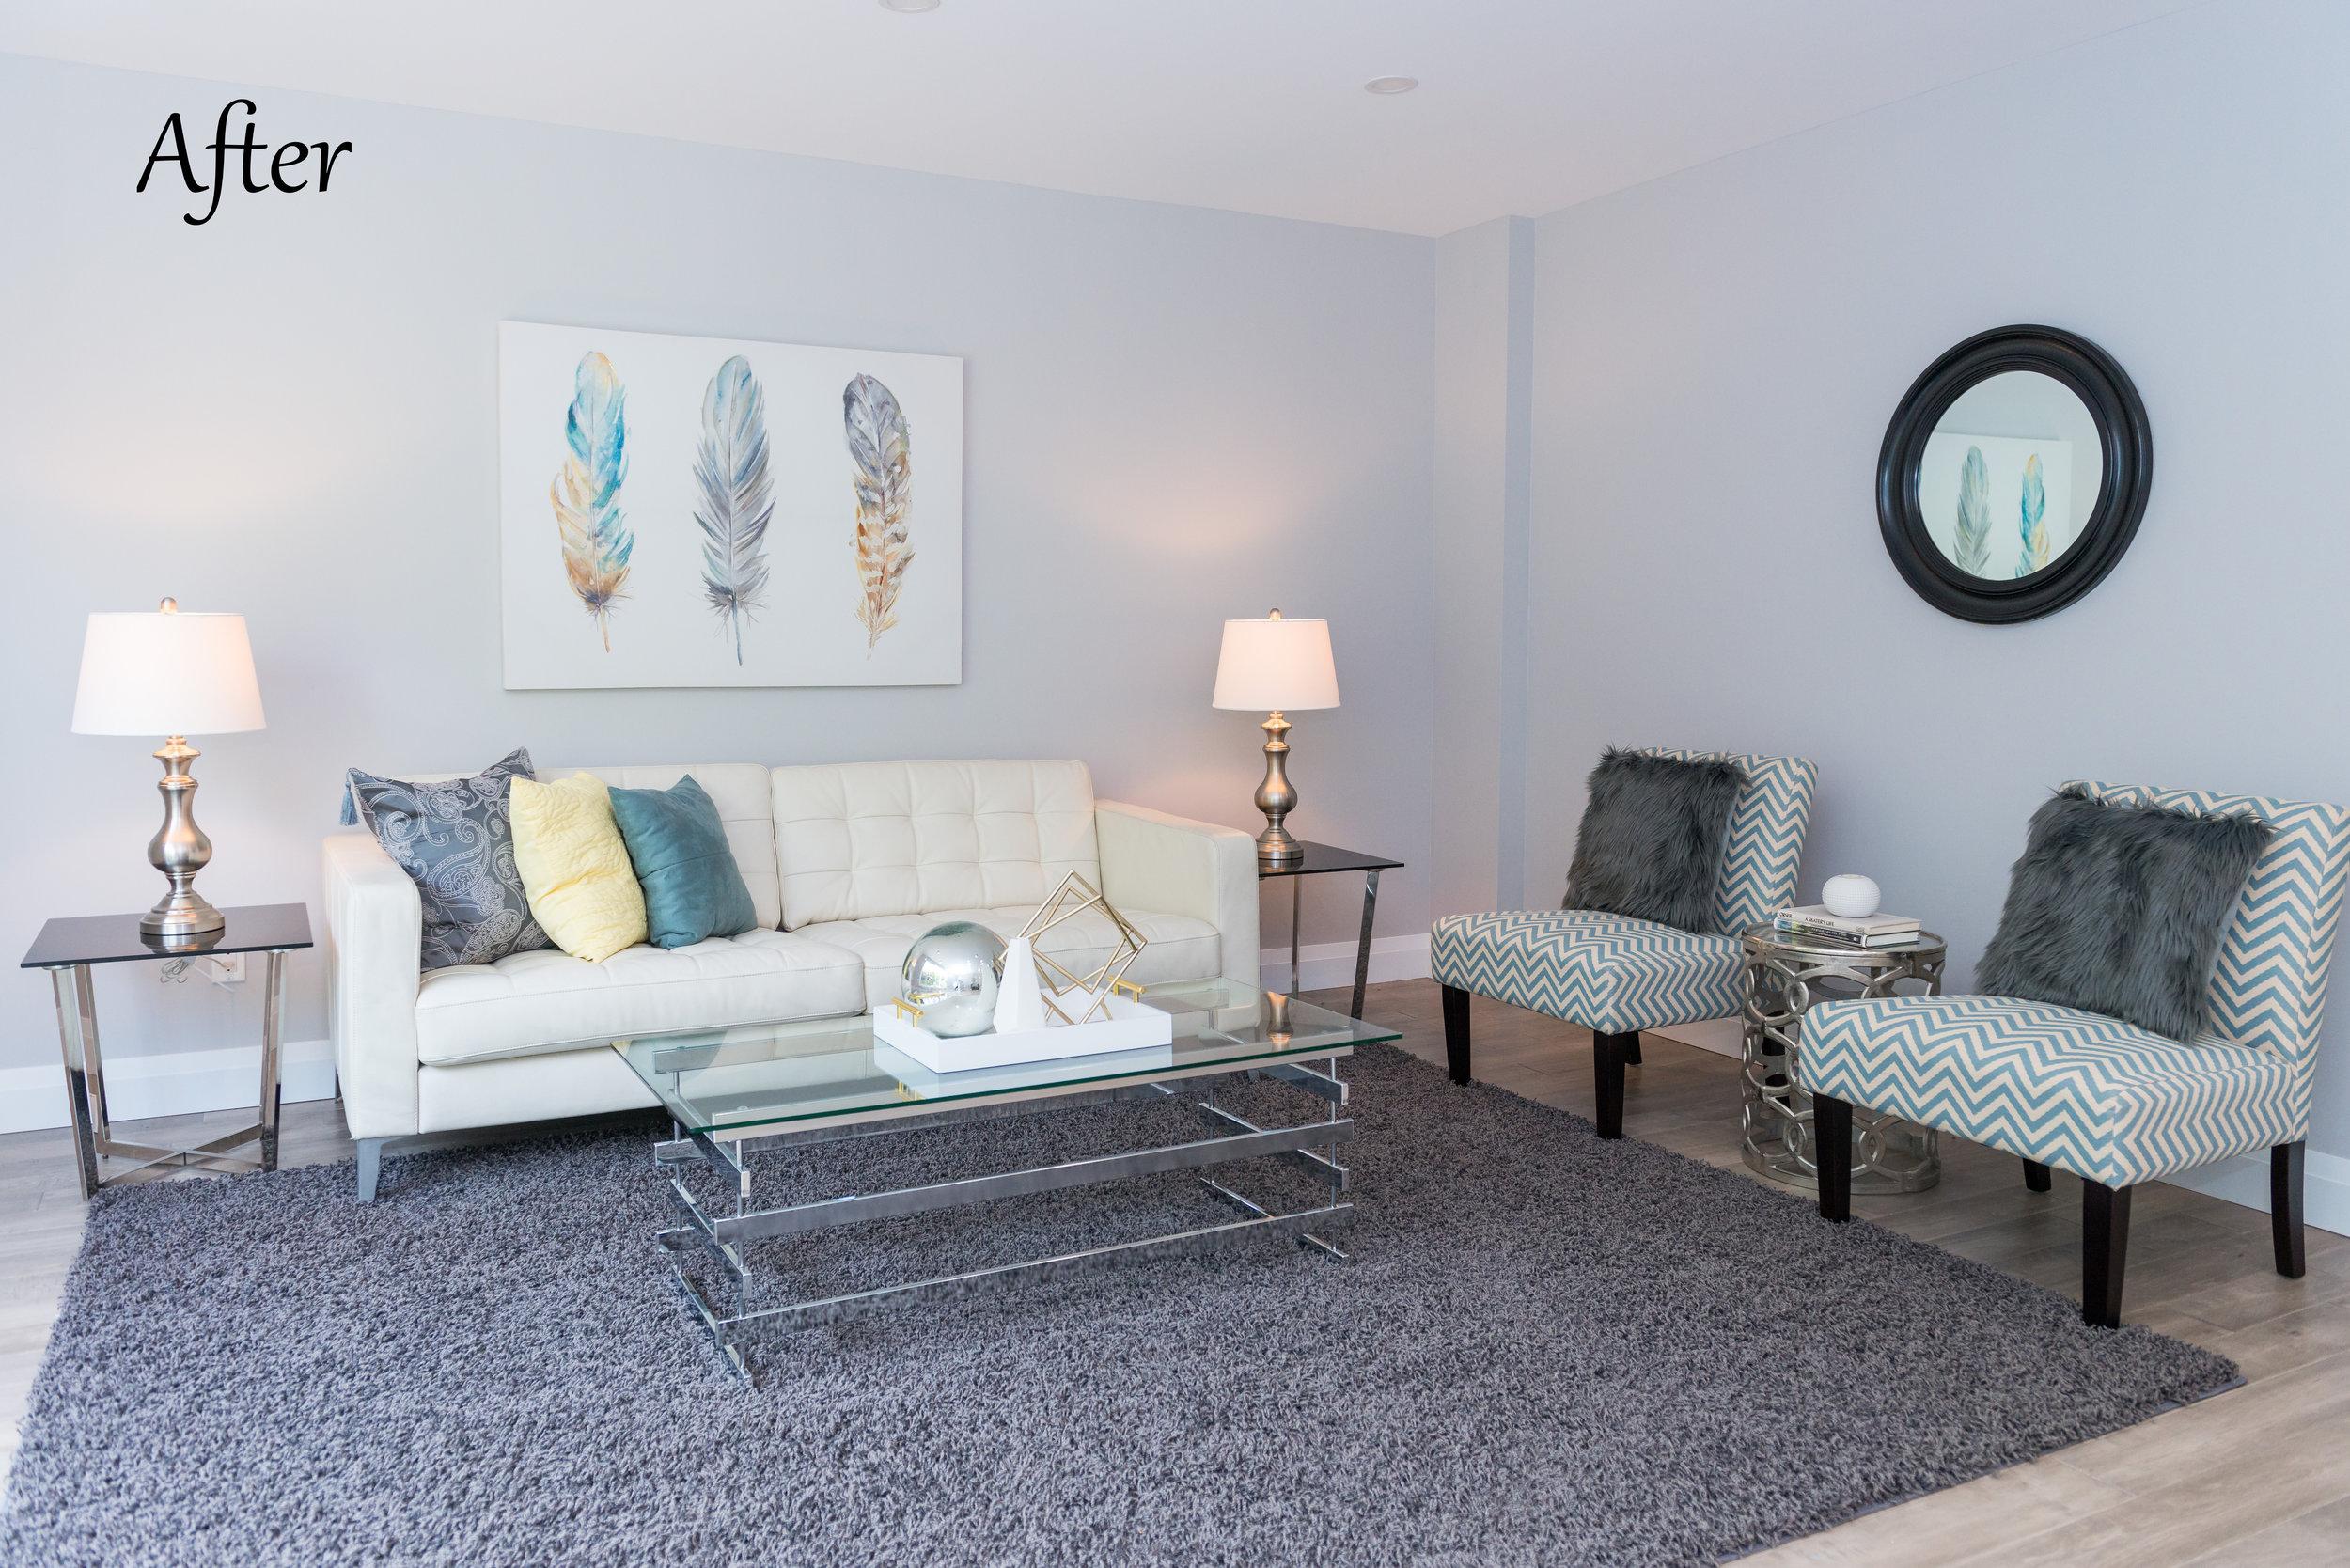 Livingroom 1 - After.jpg